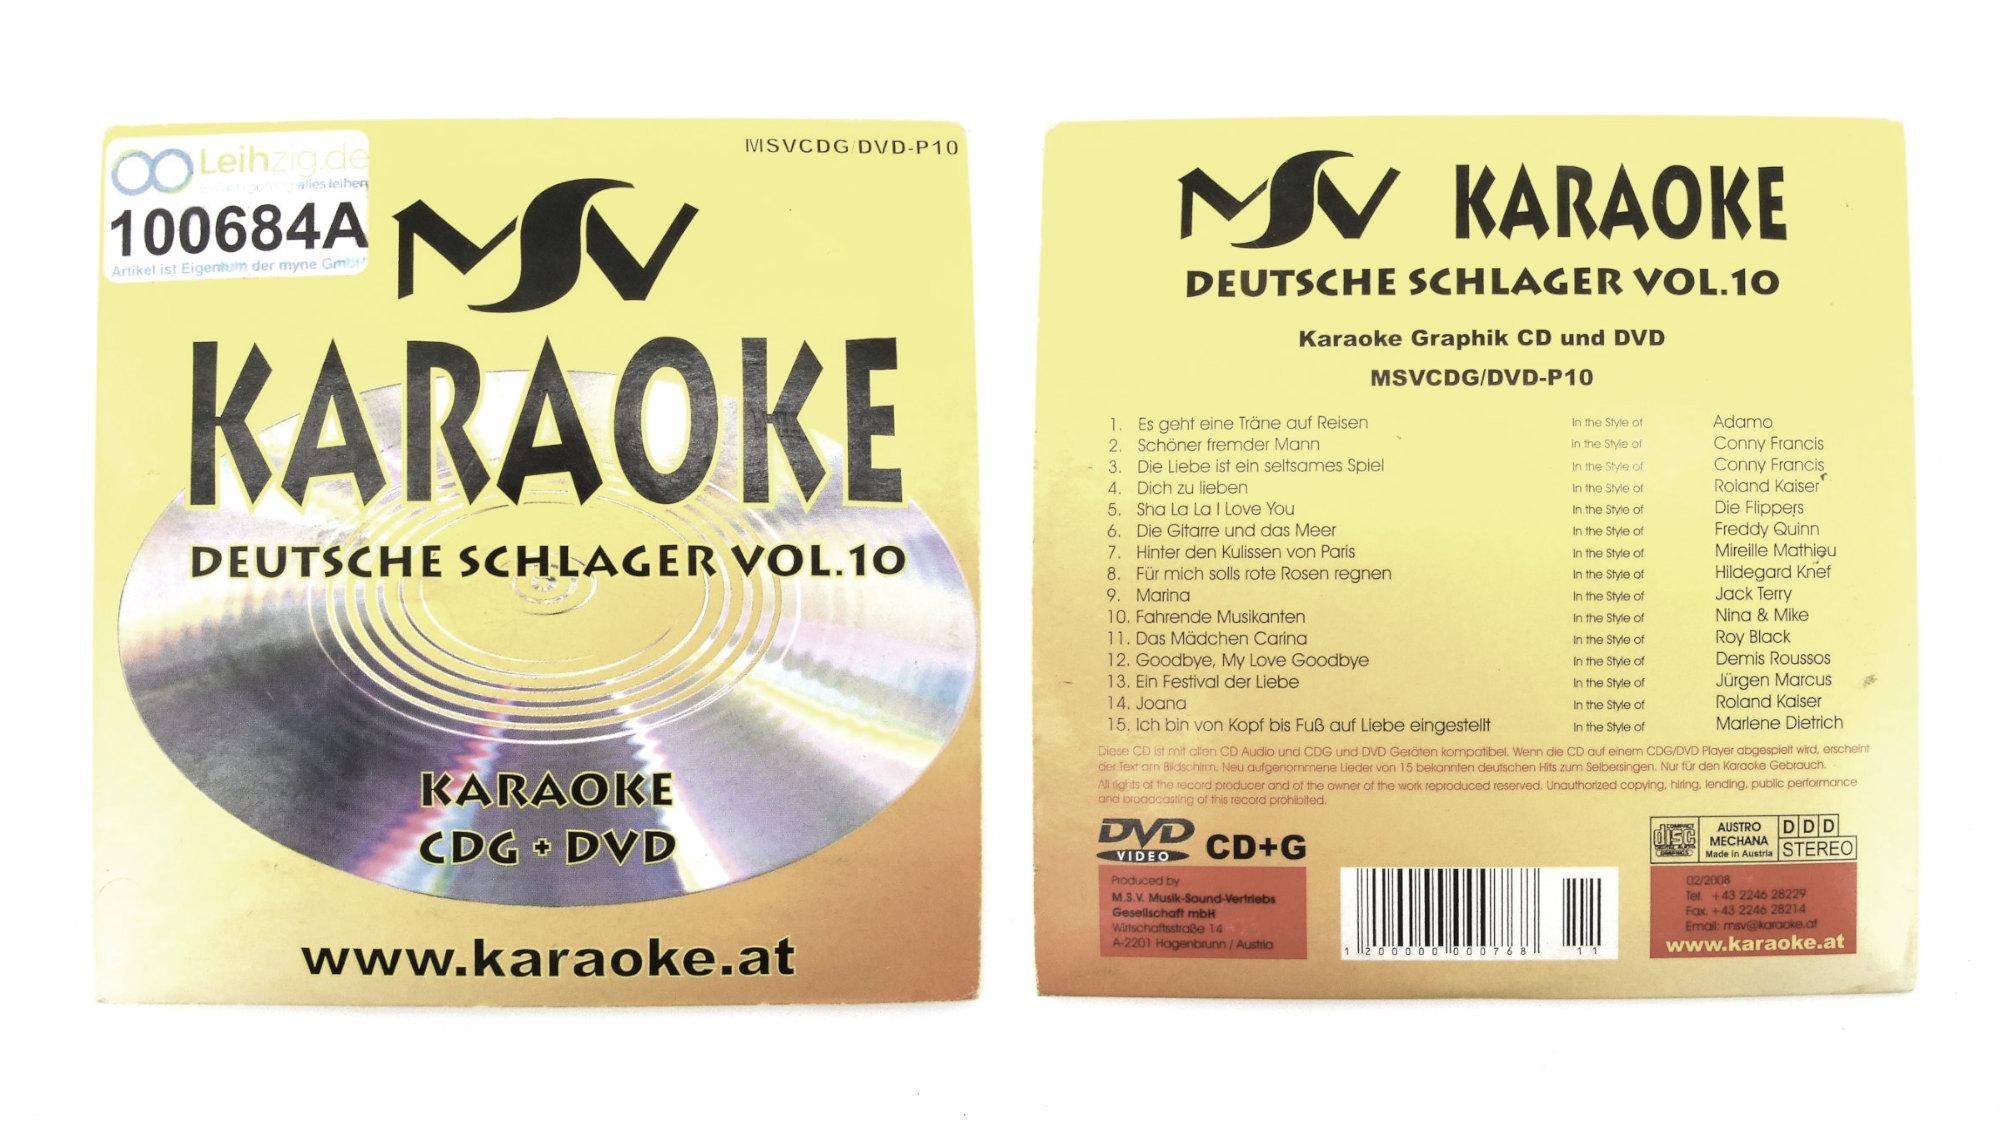 Karaoke CD Schlager Vol. 10 leihen